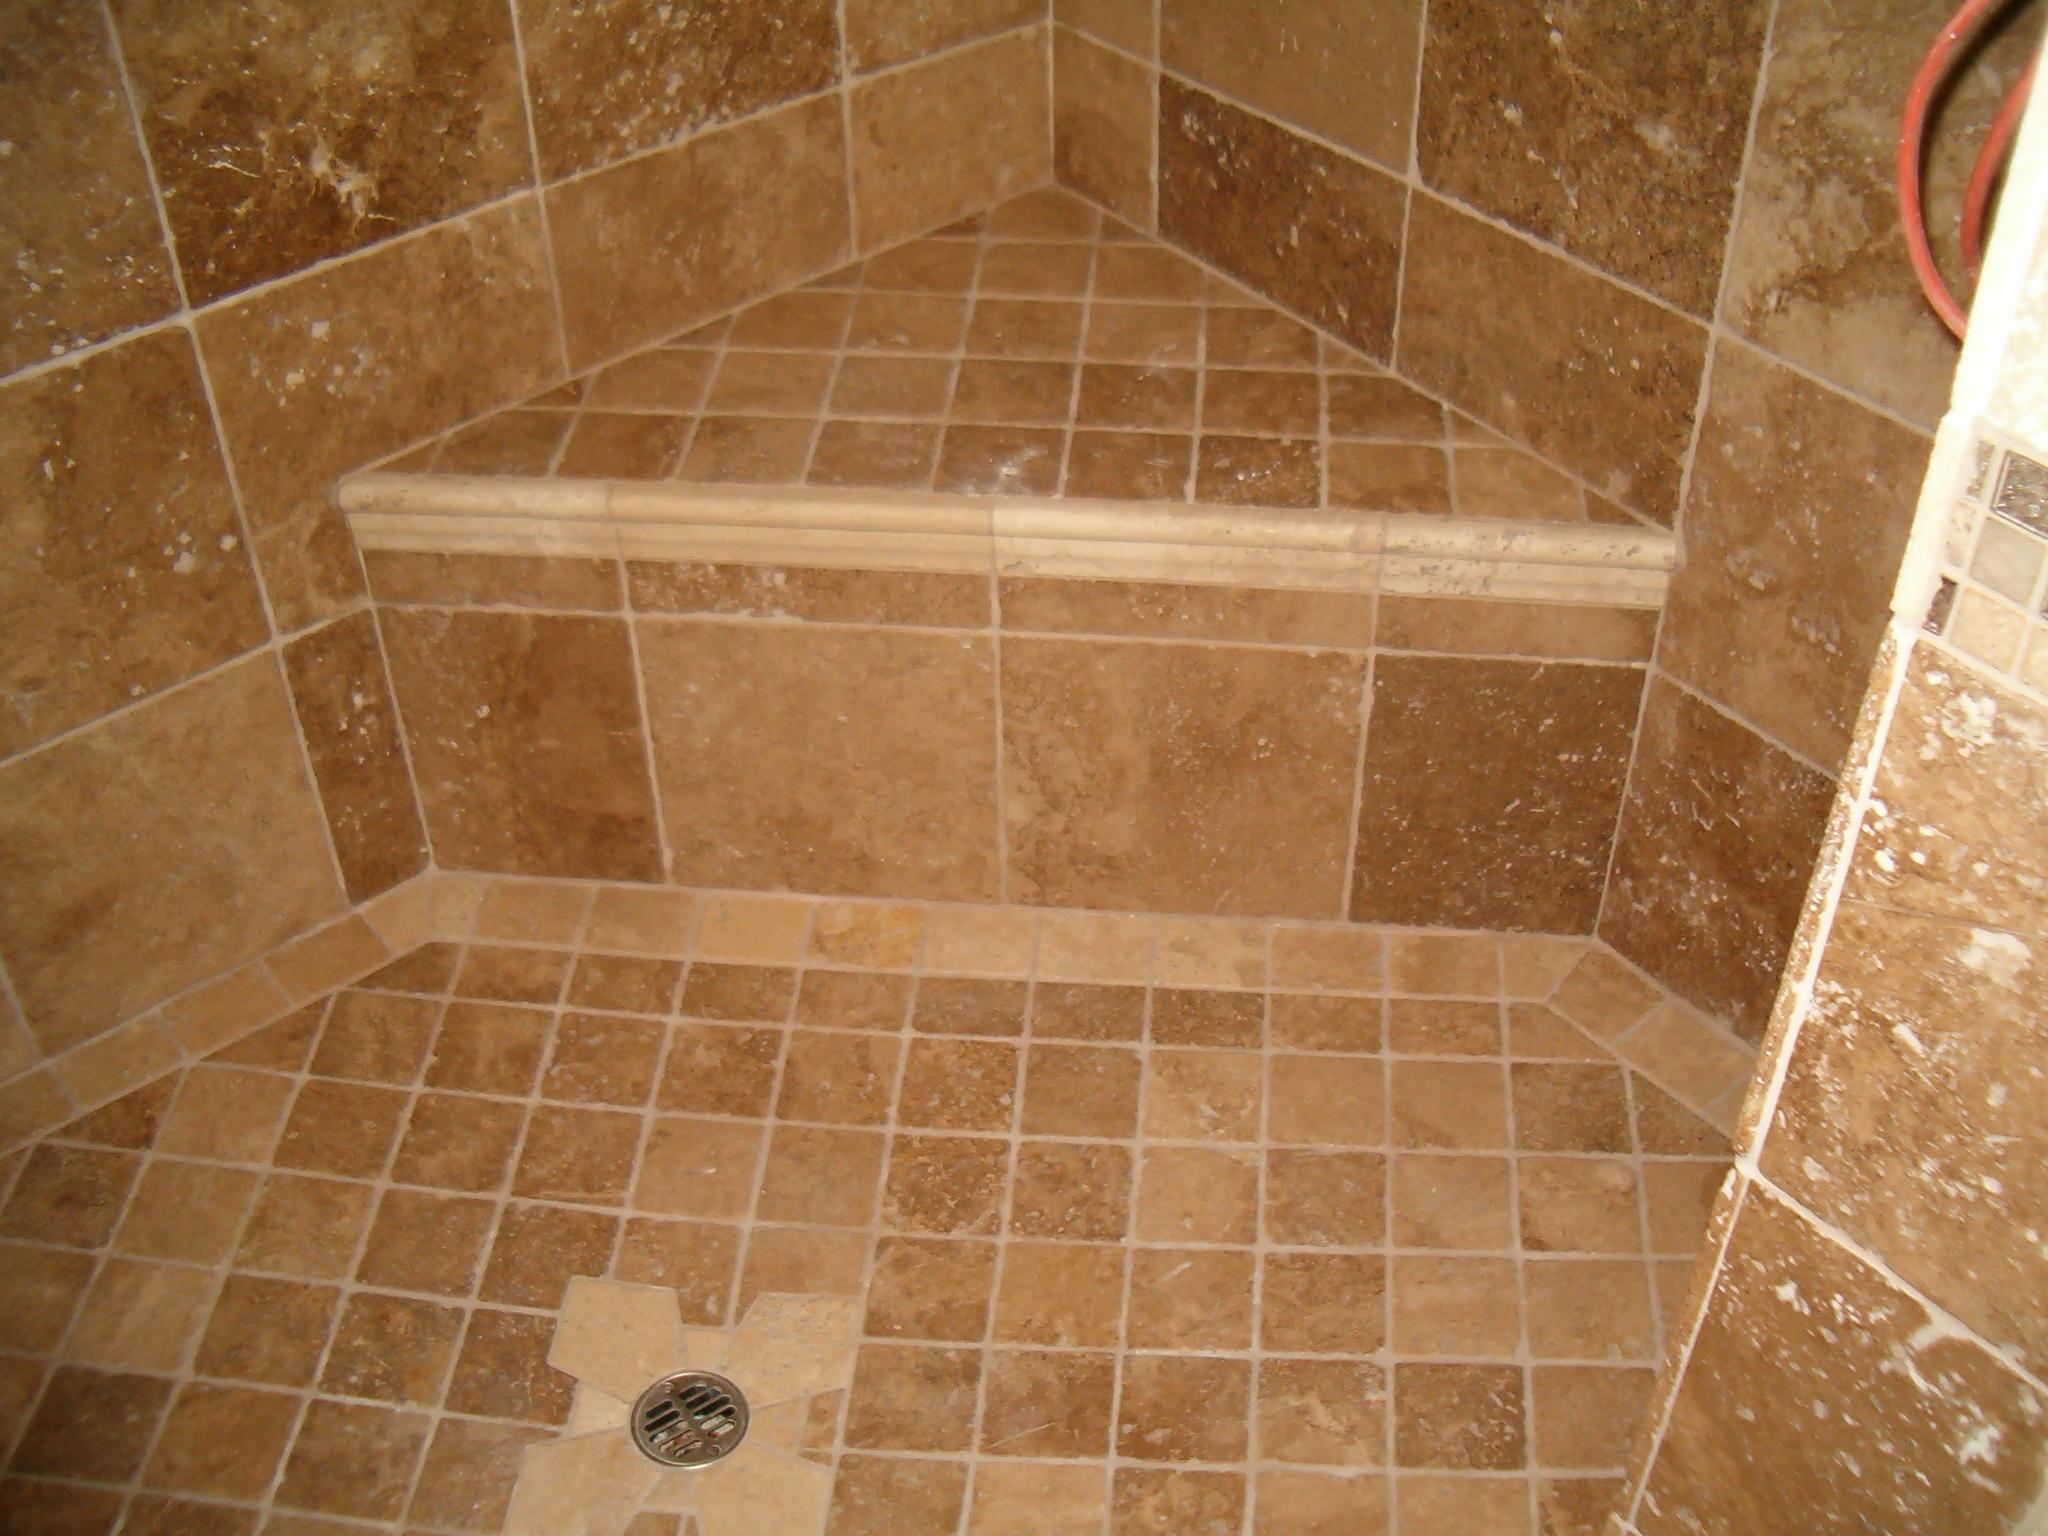 Small Corner Shower Seat | Home design ideas